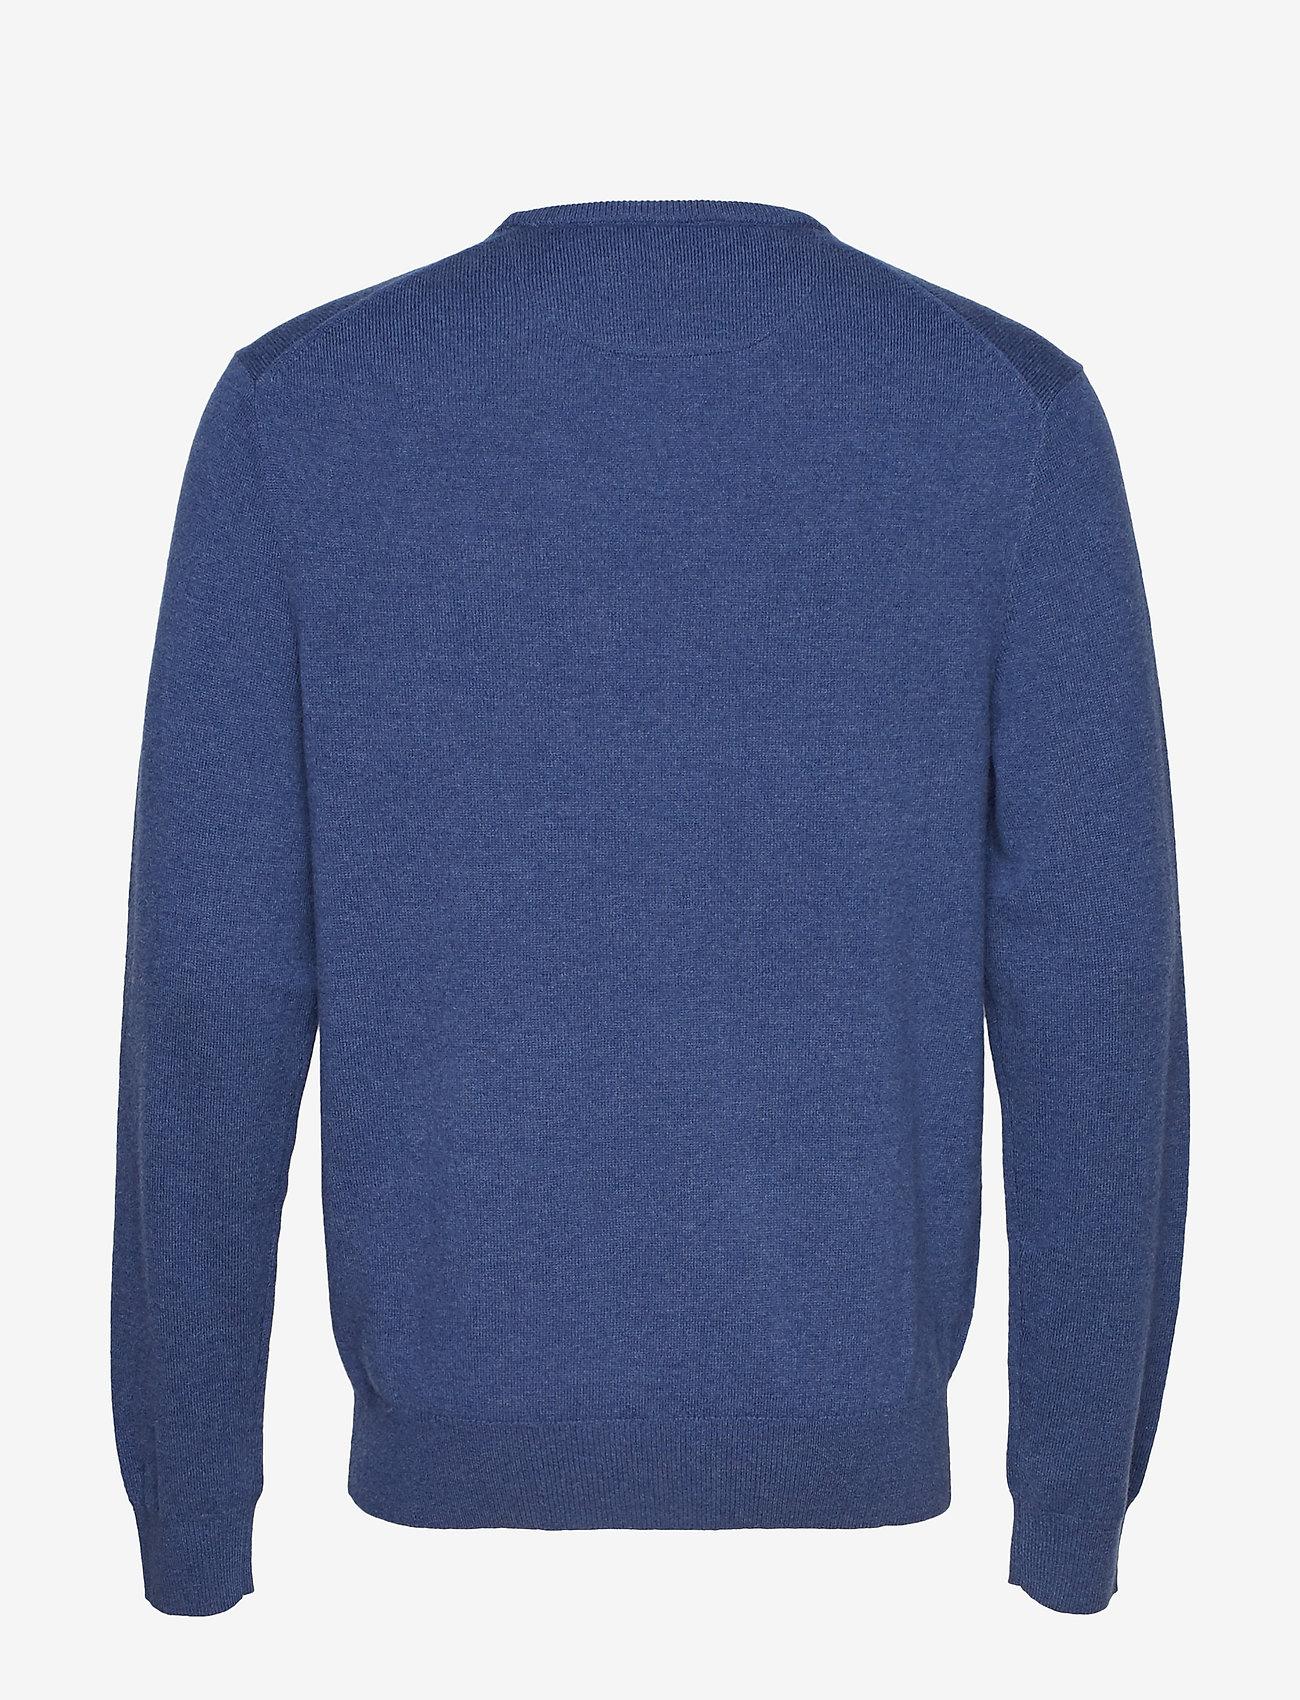 Merino Wool Crewneck Sweater (Shale Blue Heathe) - Polo Ralph Lauren csGgOC